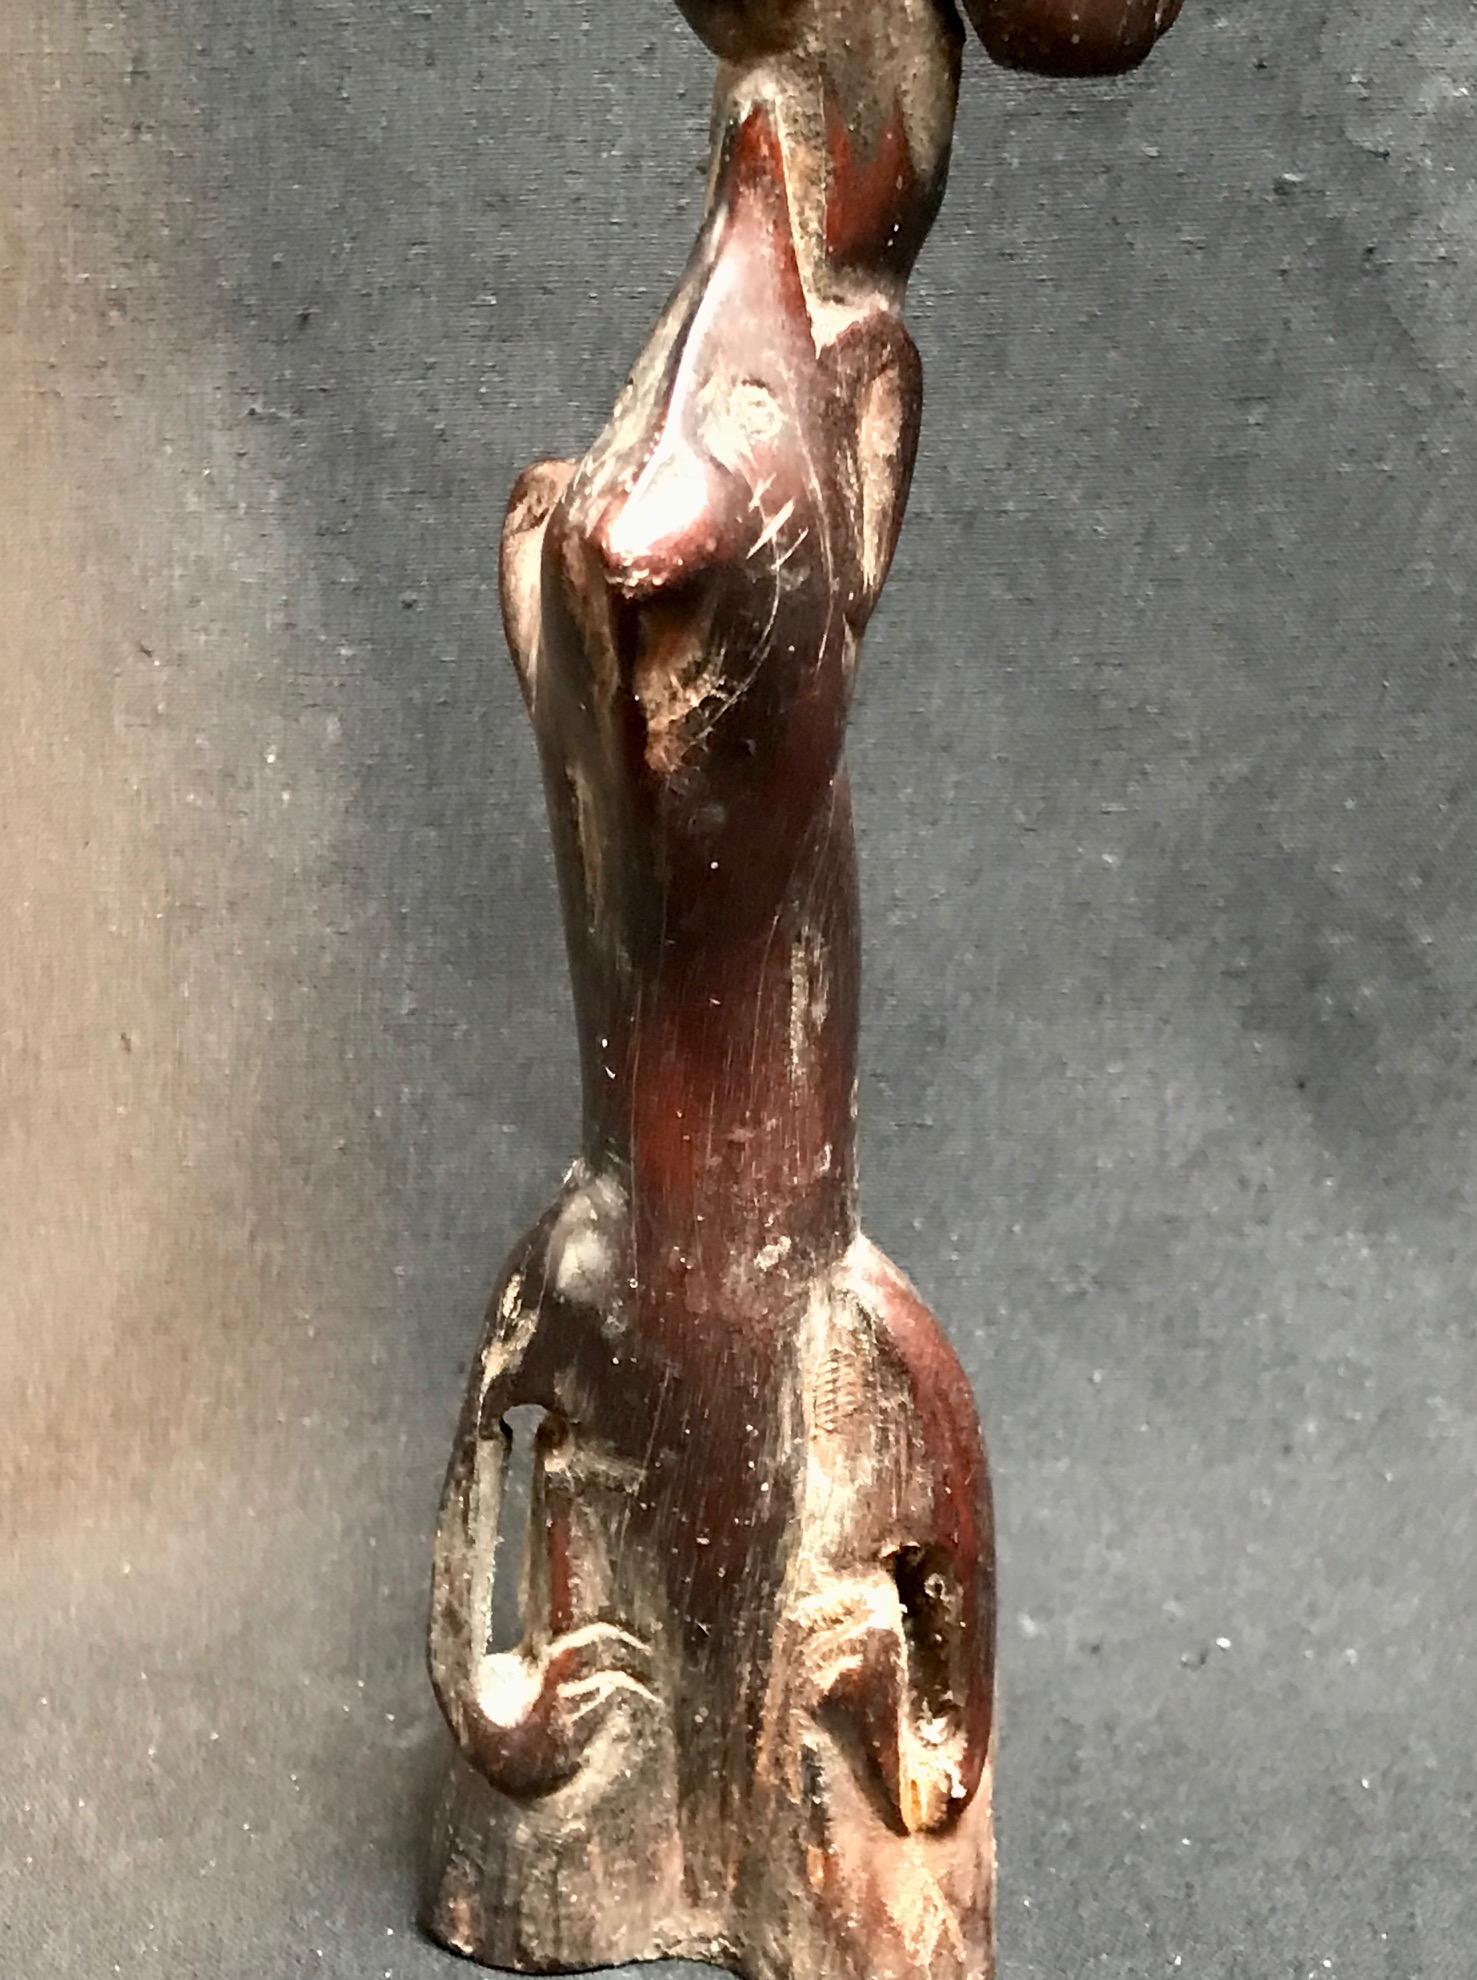 "Detail of Shaman's Power Object/Healing Wand, Cat, Horse, Dog, Bird, Sumba Island, Indonesia, Early 20th c., wood, 9 1/2"" x 2 1/4"" x 2"""